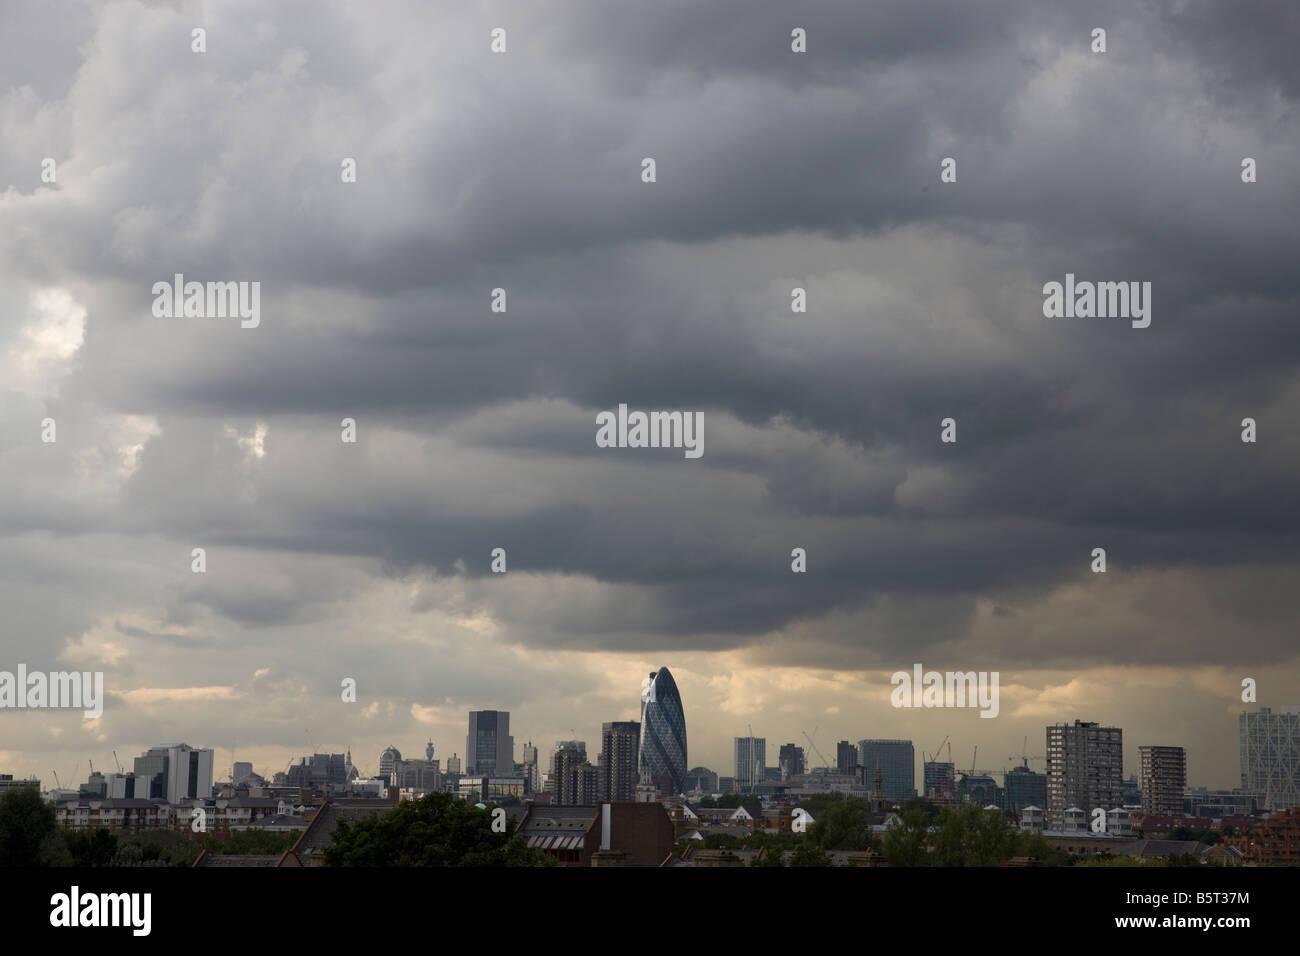 UK London Stormy skies over city - Stock Image